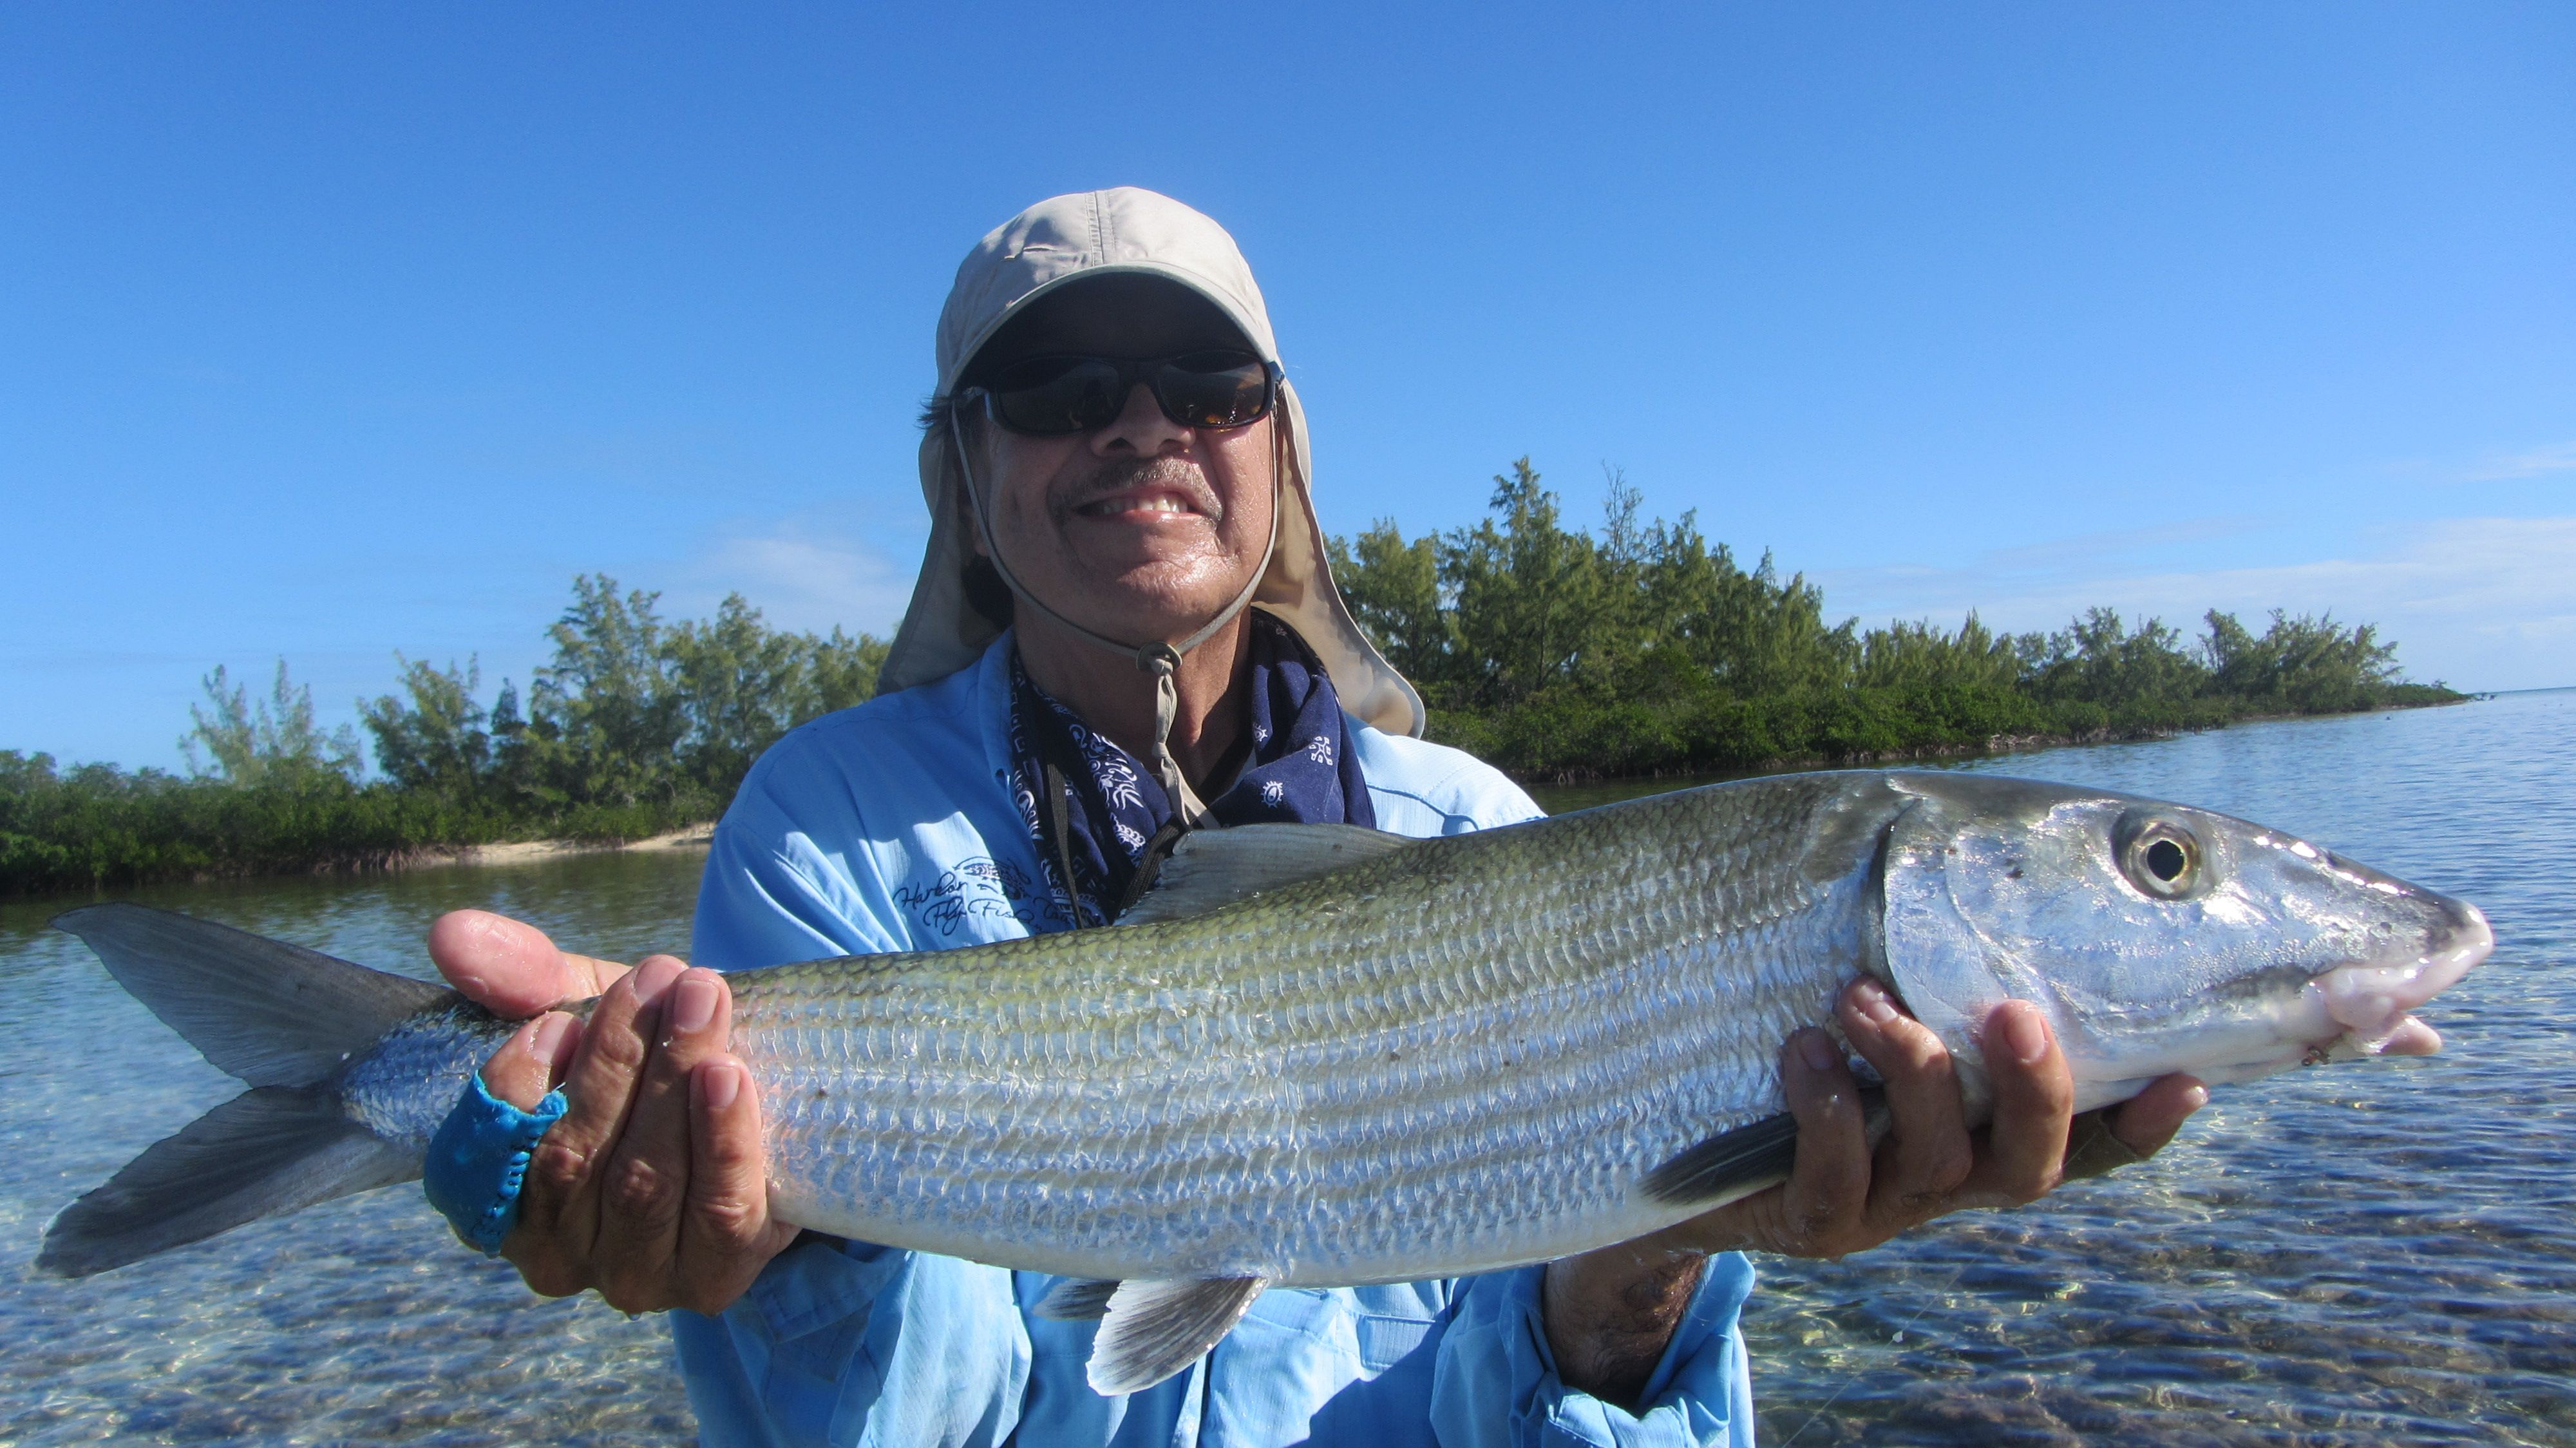 10lb Bonefish In Andros Island Bahamas Fly Fishing Water Adventure Fish